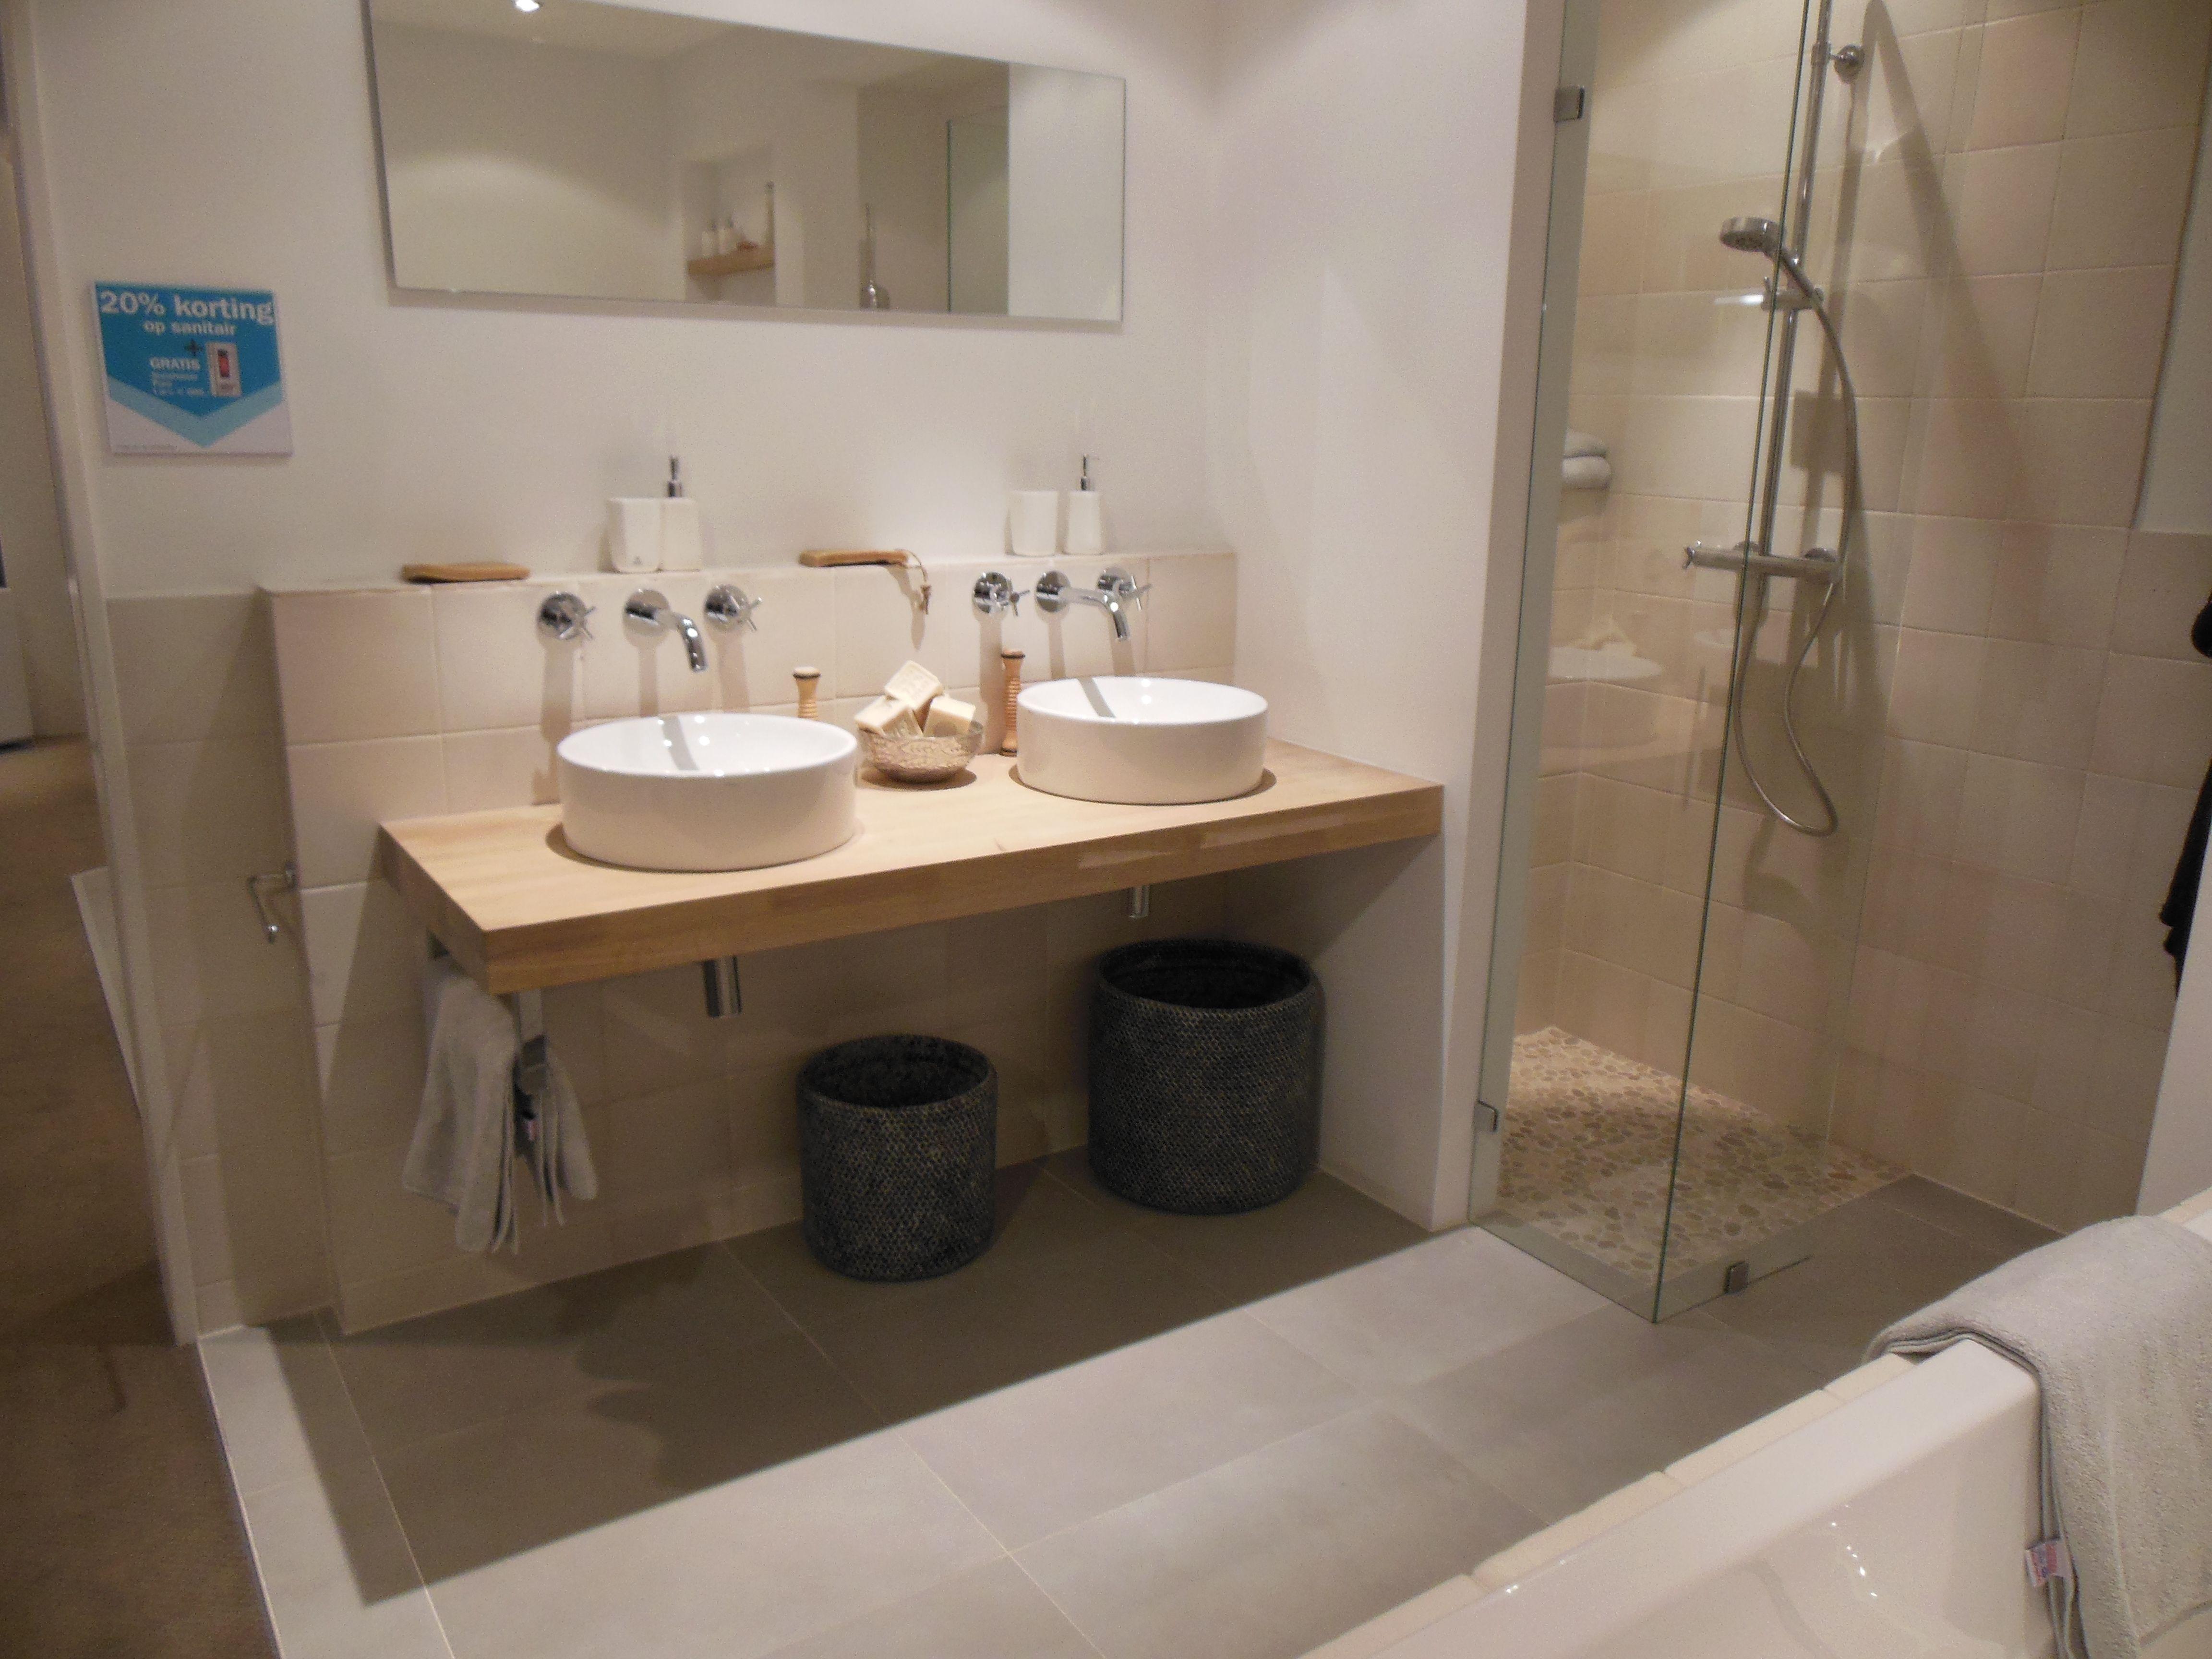 Brugman badkamers | Badkamer | Pinterest